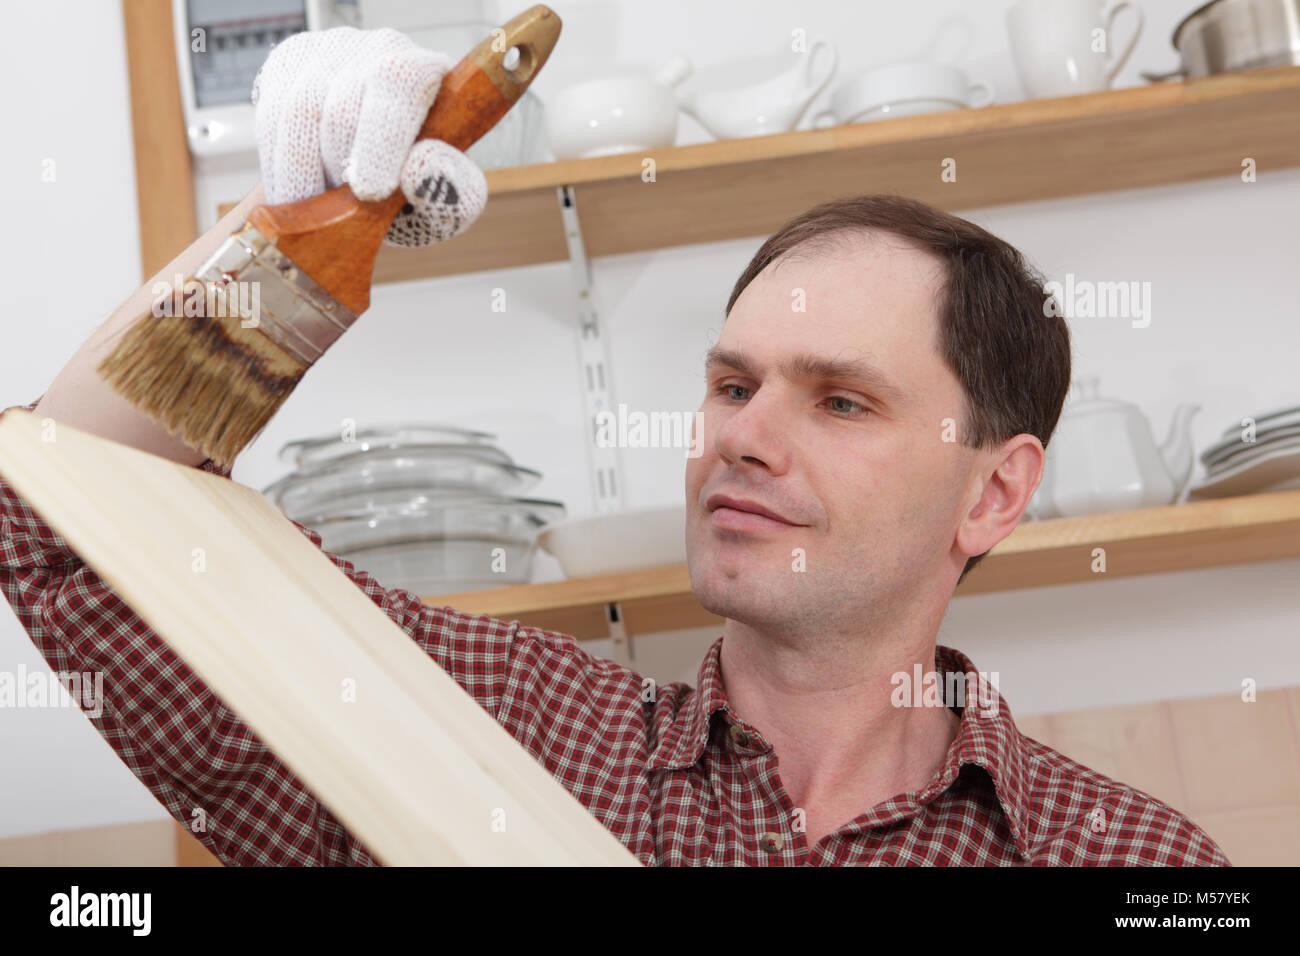 Man varnishing wood shelves for kitchen renovation - Stock Image